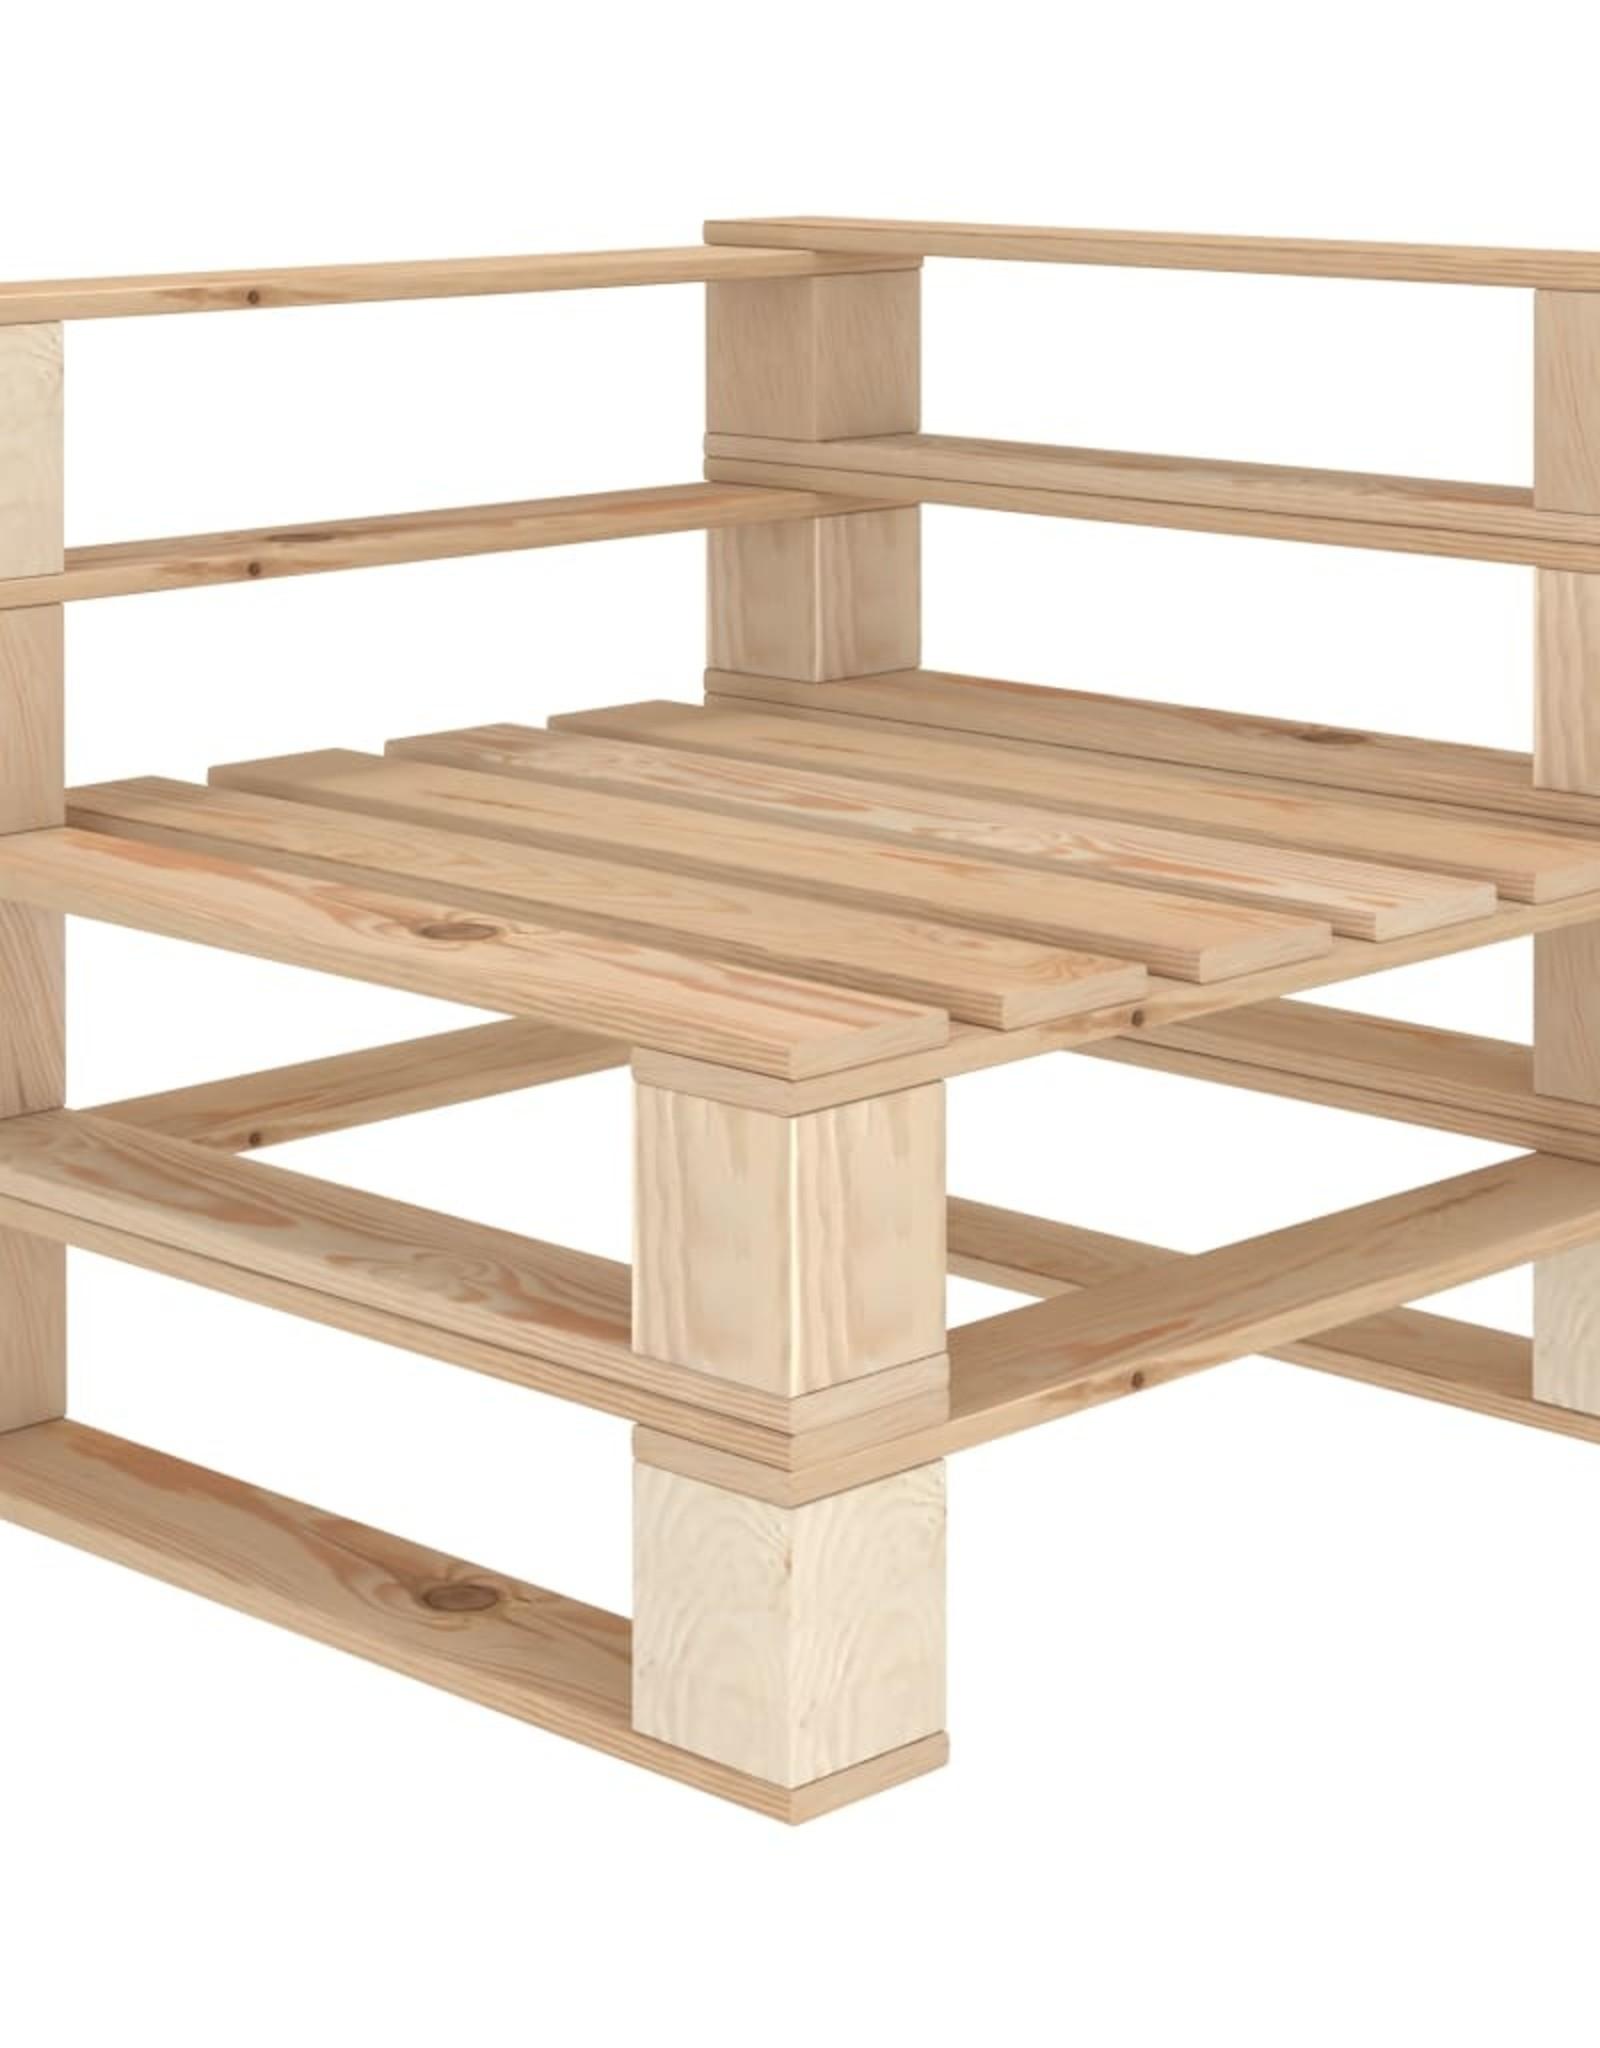 5-delige Loungeset pallet hout